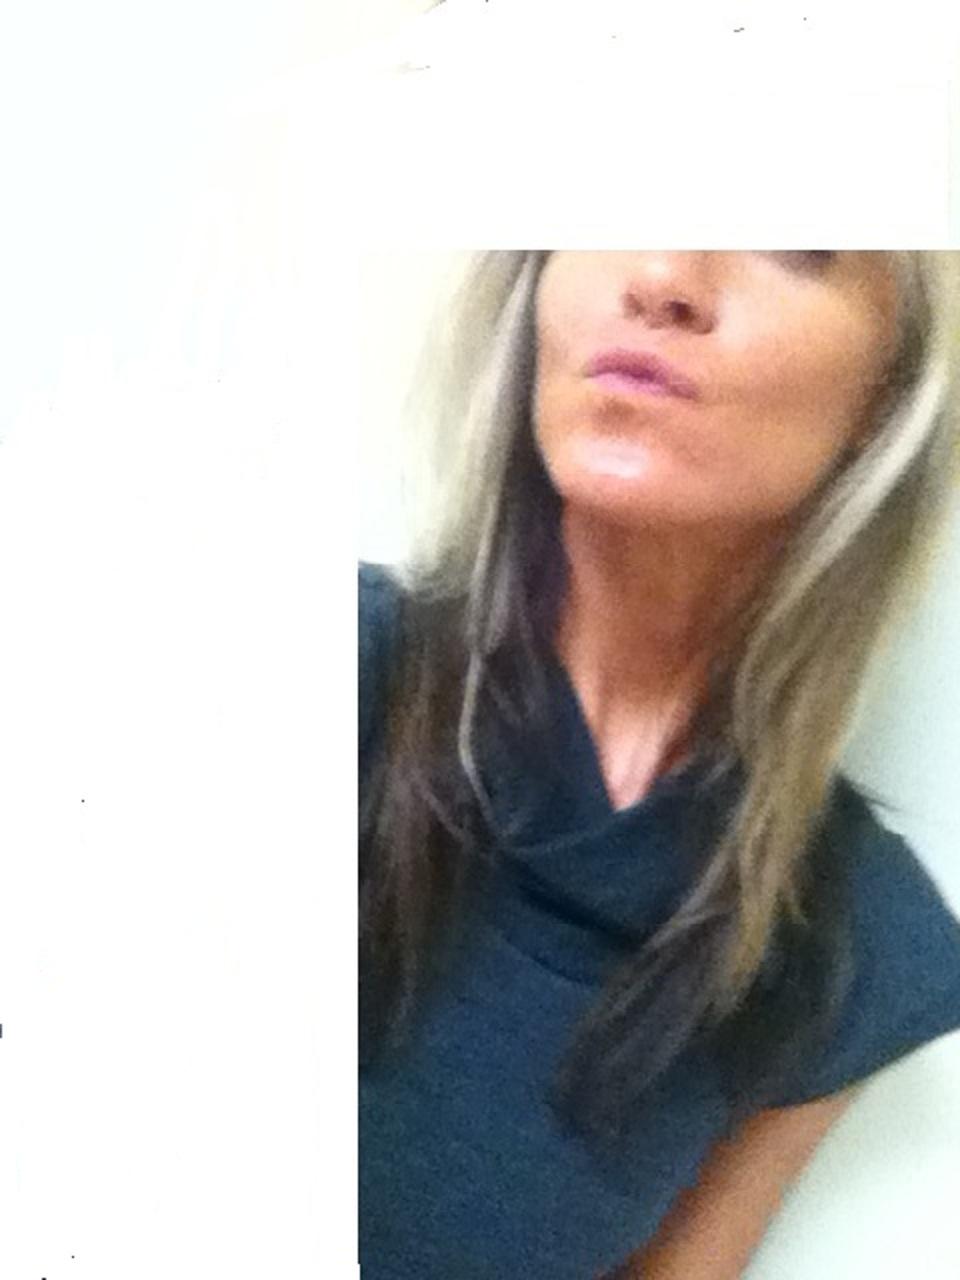 SugarBaby profile Vbgirl01